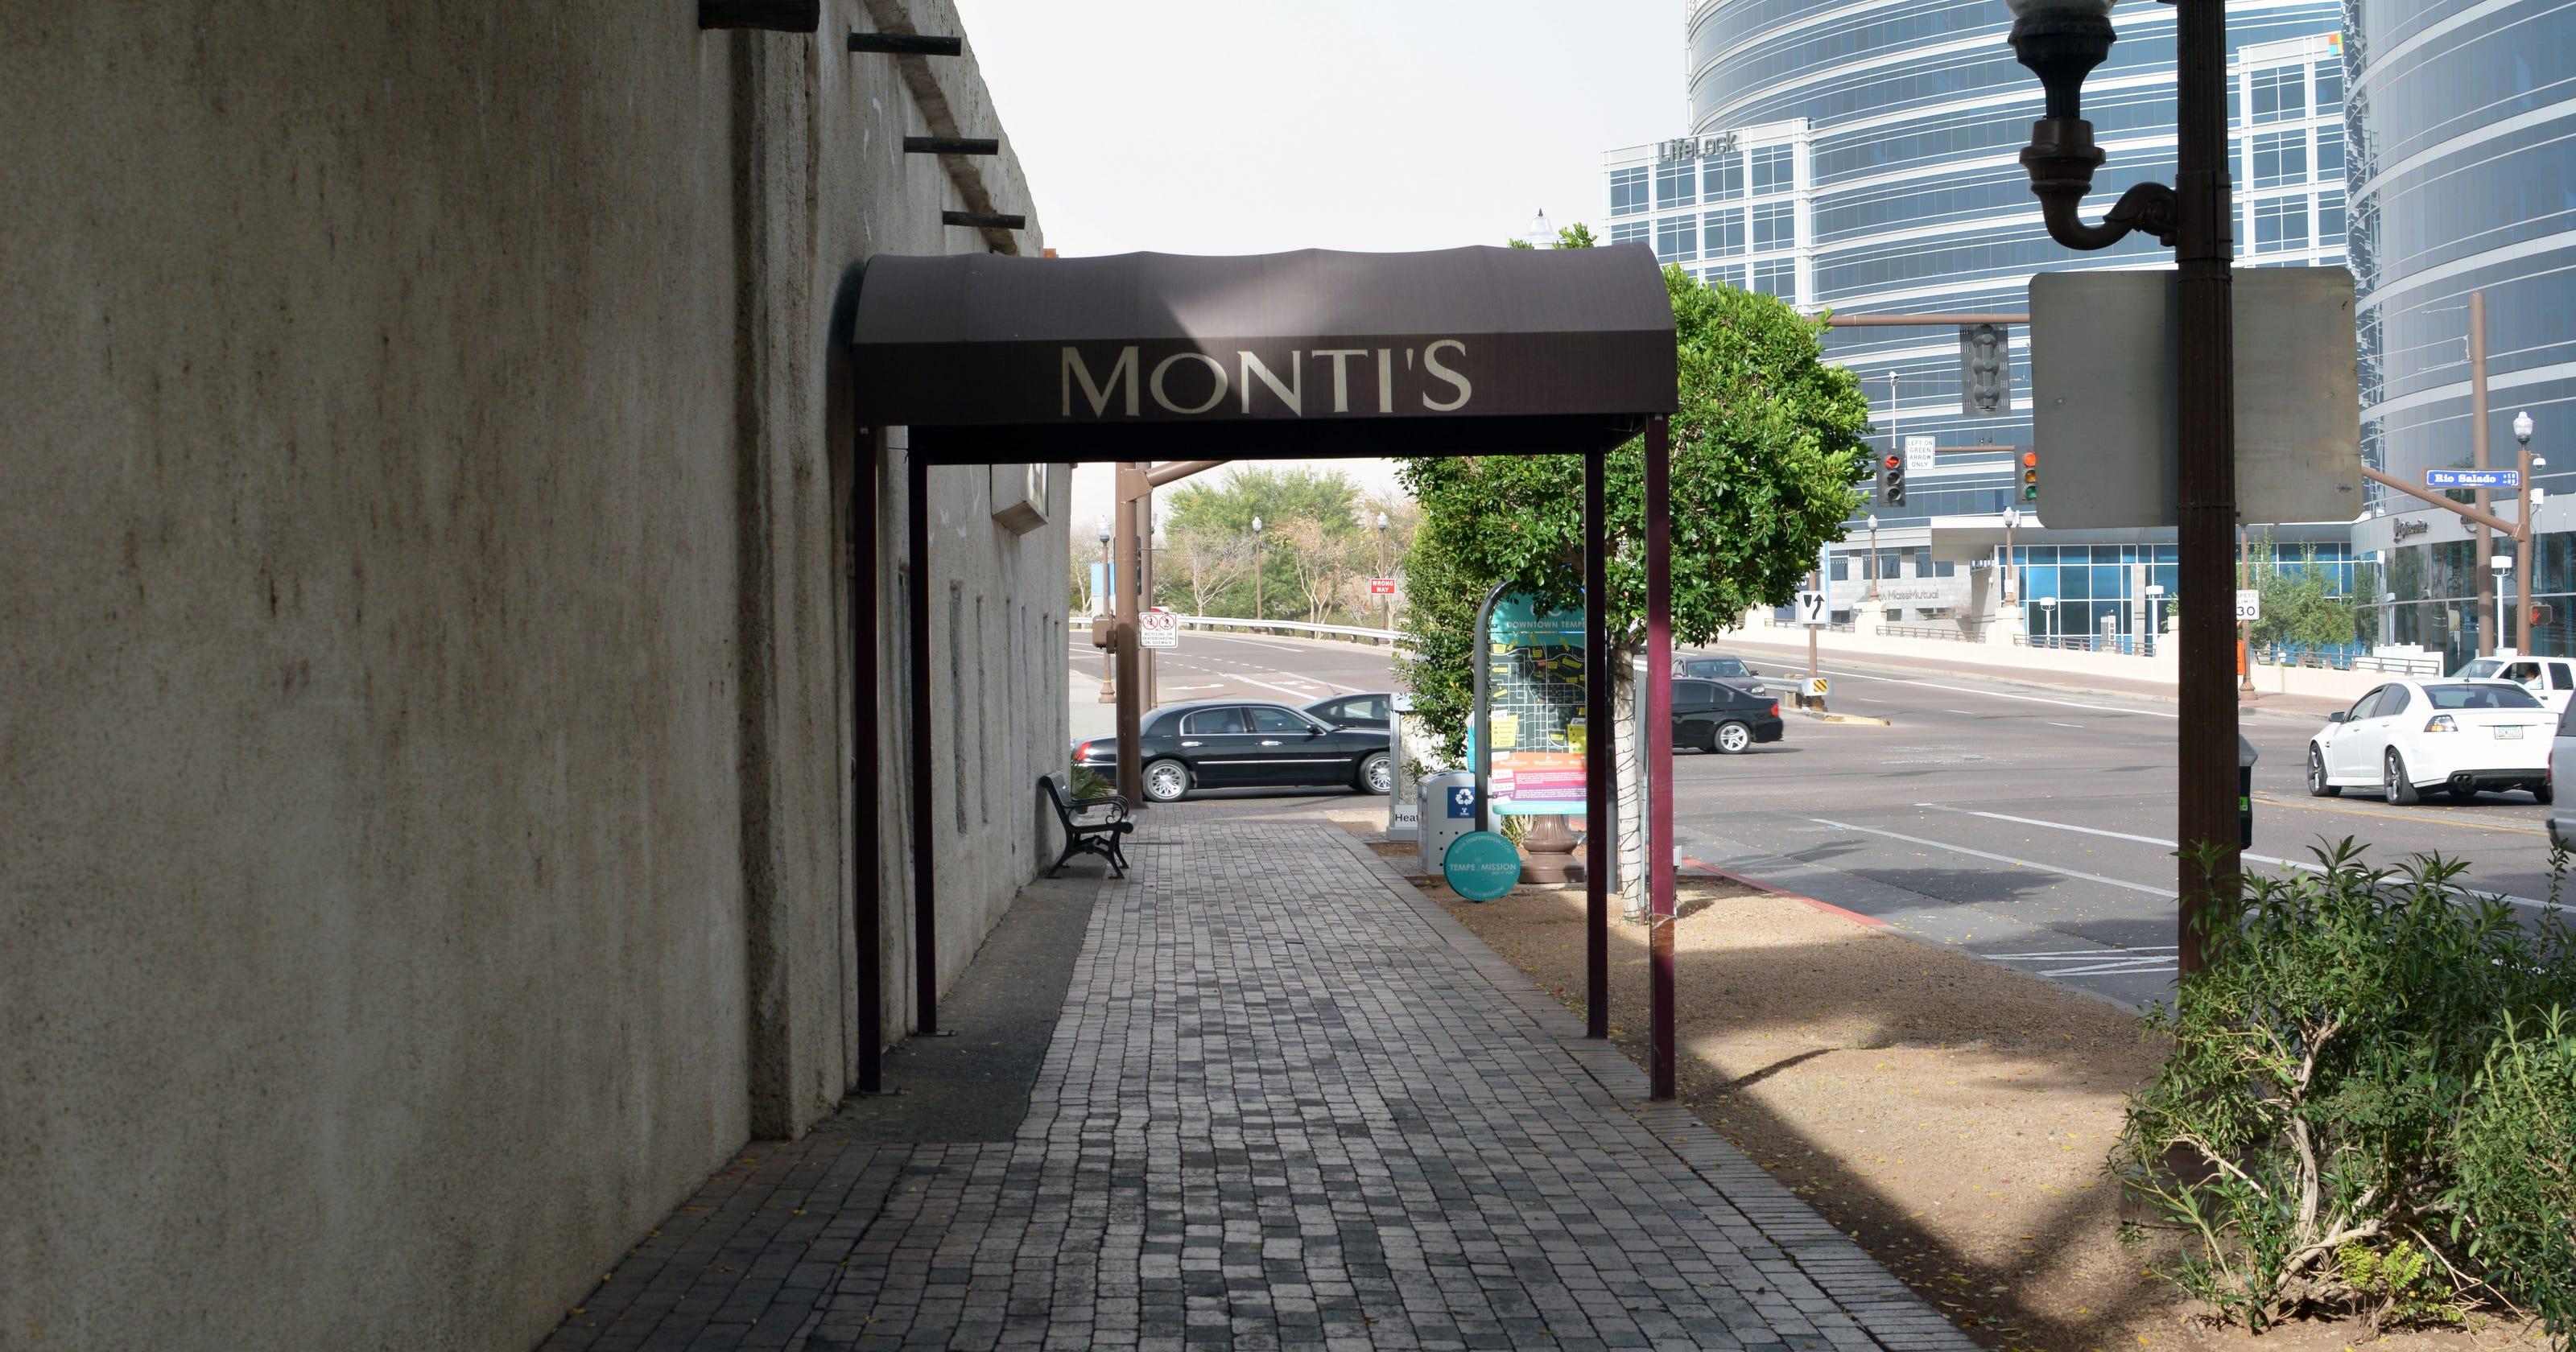 Tempe Plans To Buy Back Historic Montis La Casa Vieja For 10